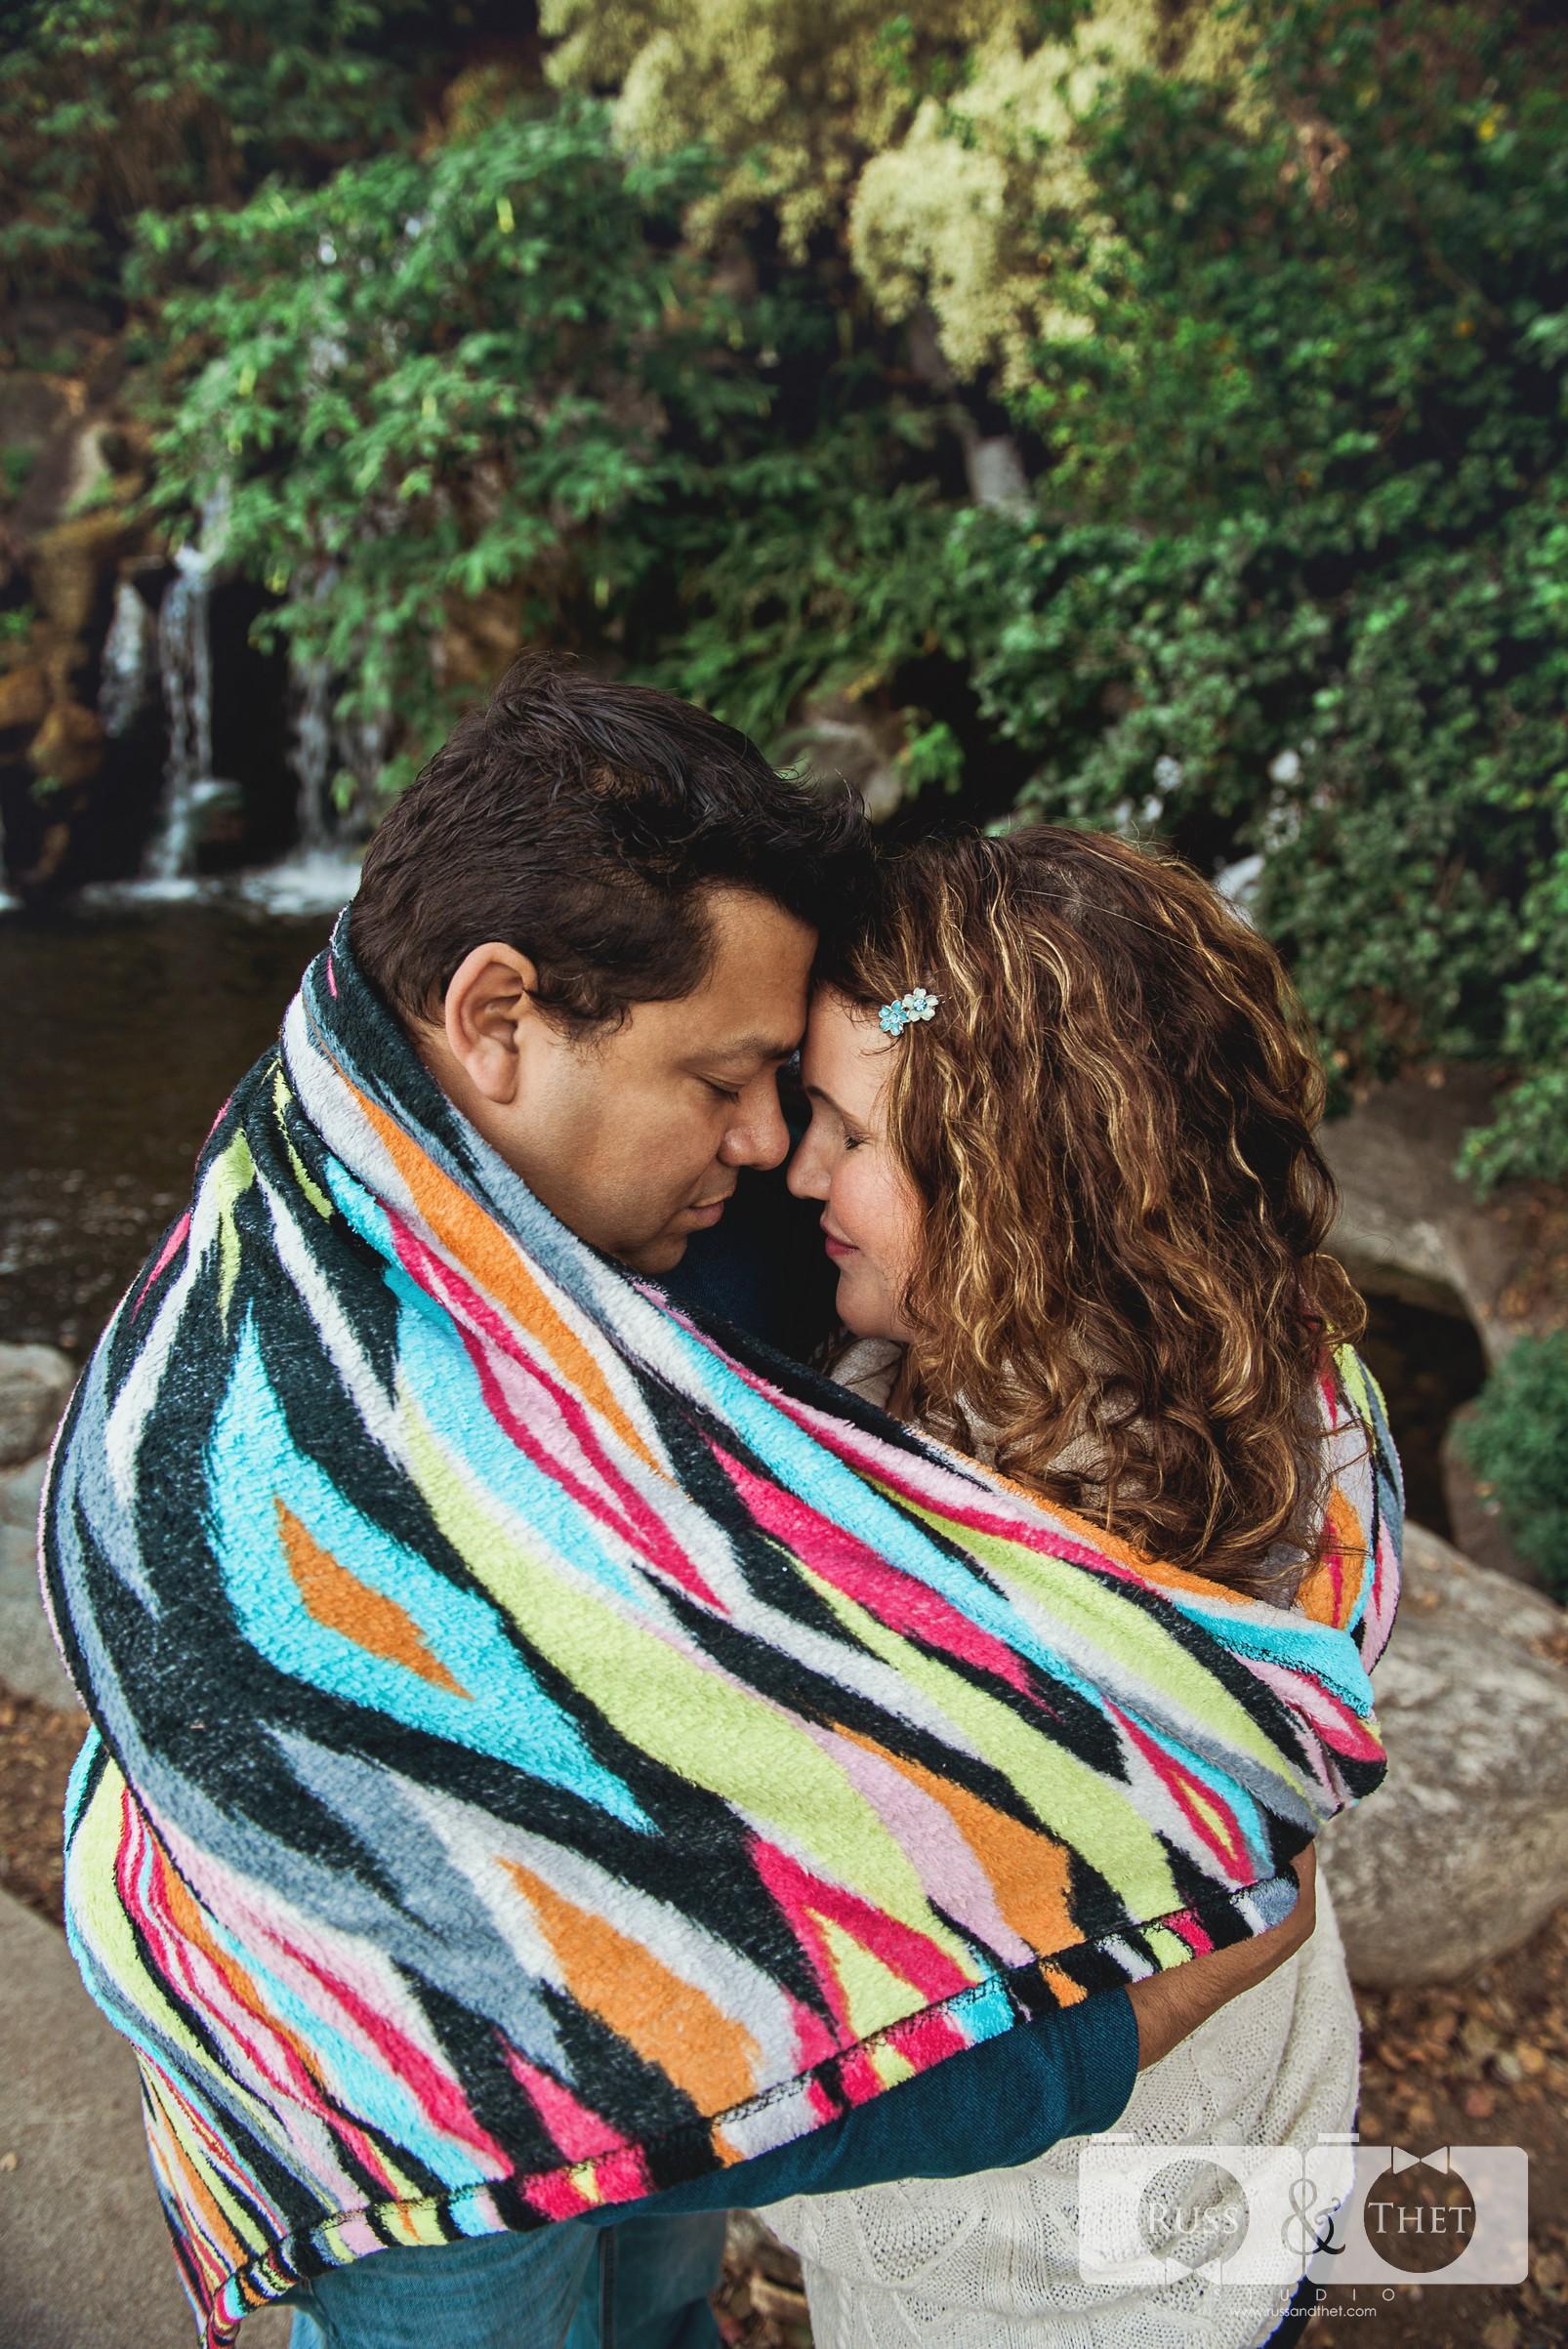 Hector&Vanessa-LA-Arboretum-Engagement-Photographer (3).jpg